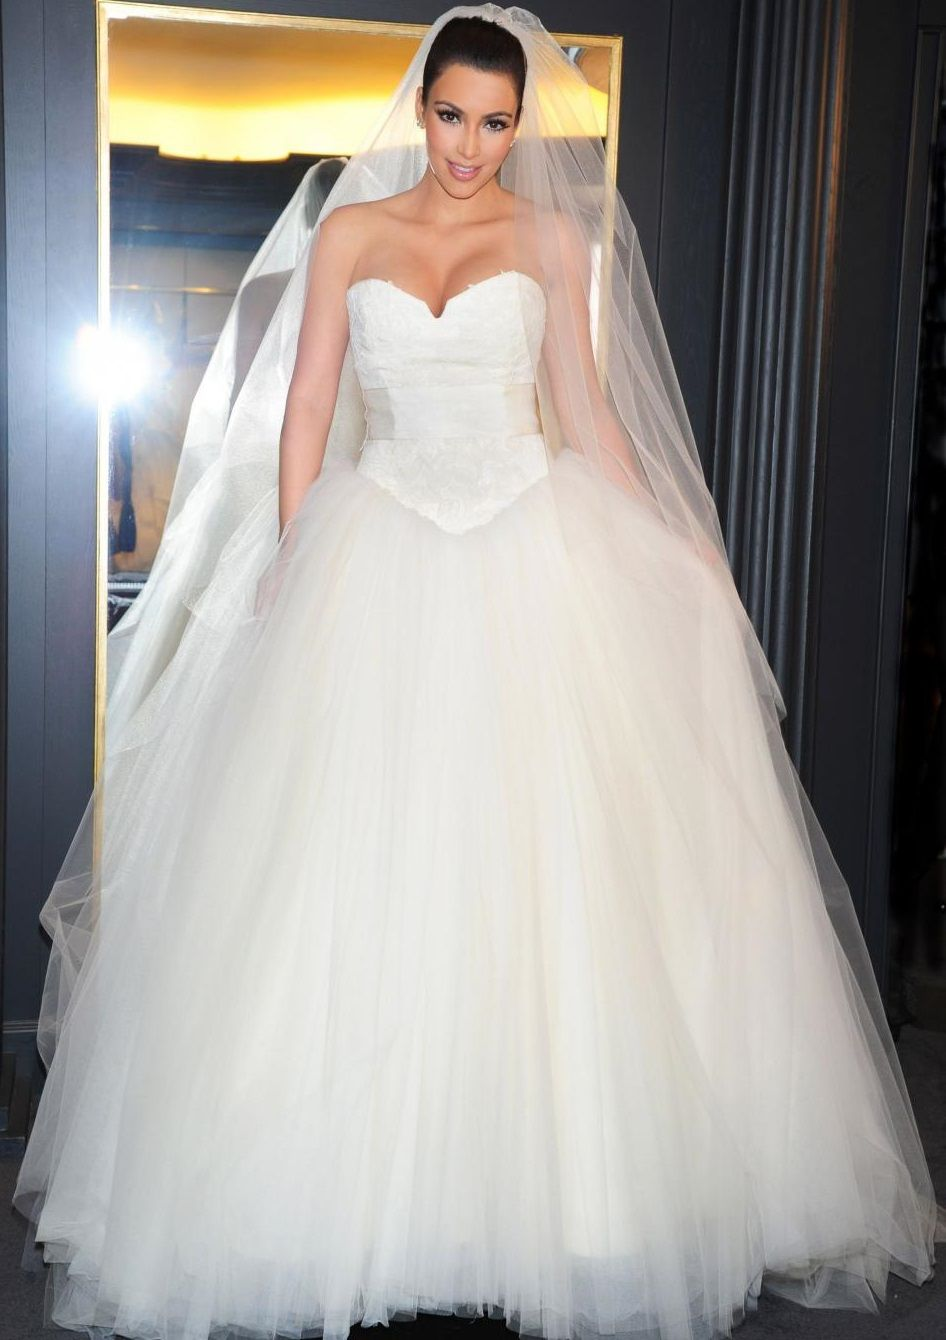 Celebrity Wedding Dresses: Top 12 Most Noticeable Gowns - Kim ...